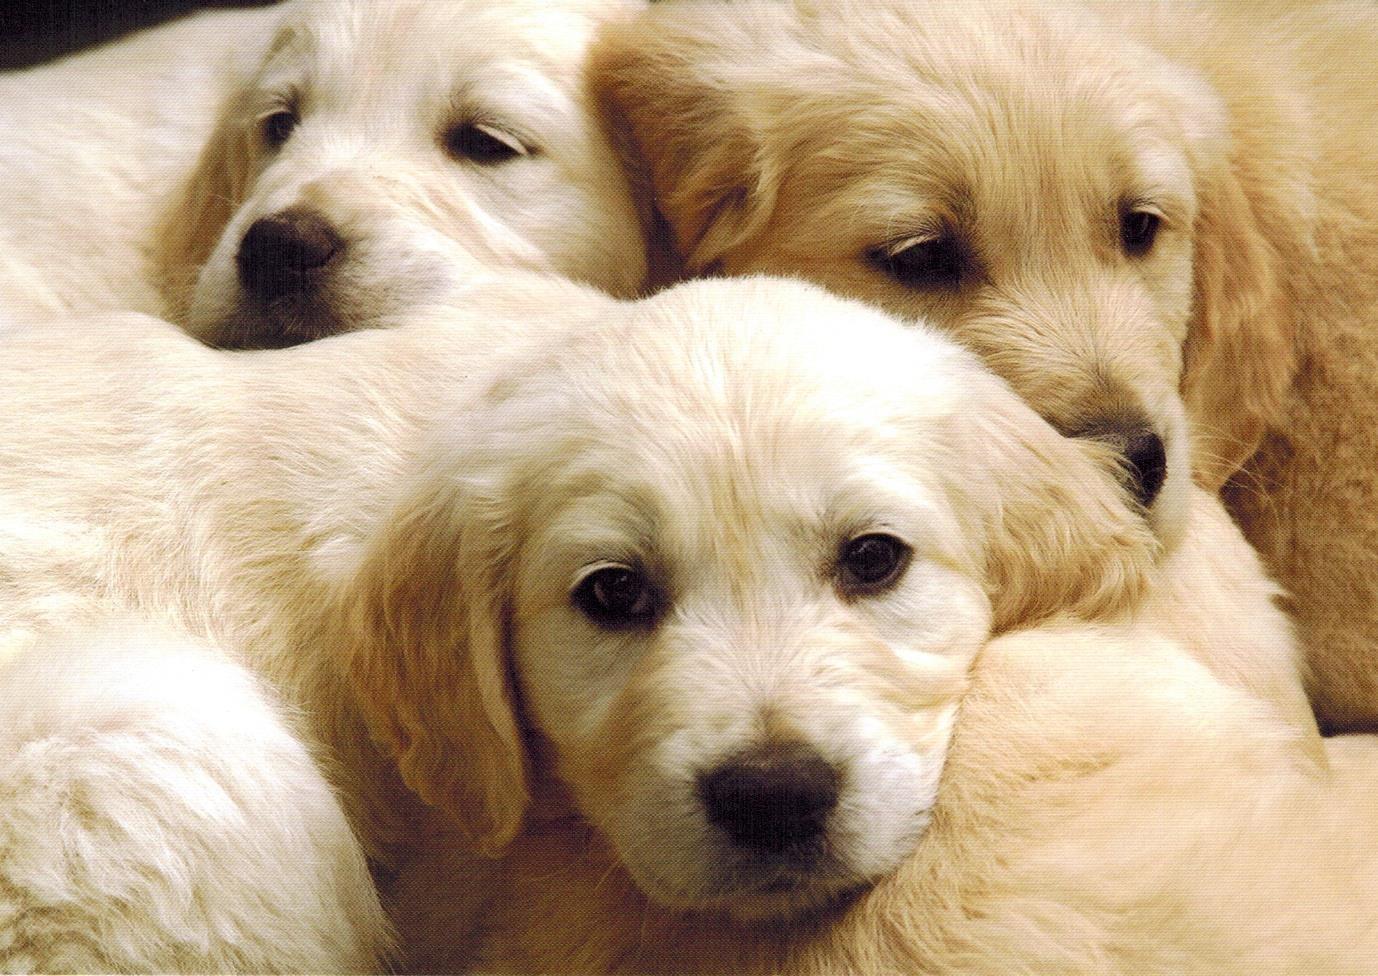 Golden Retriever Puppy For Sale In Houston Tx Adn 71245 On